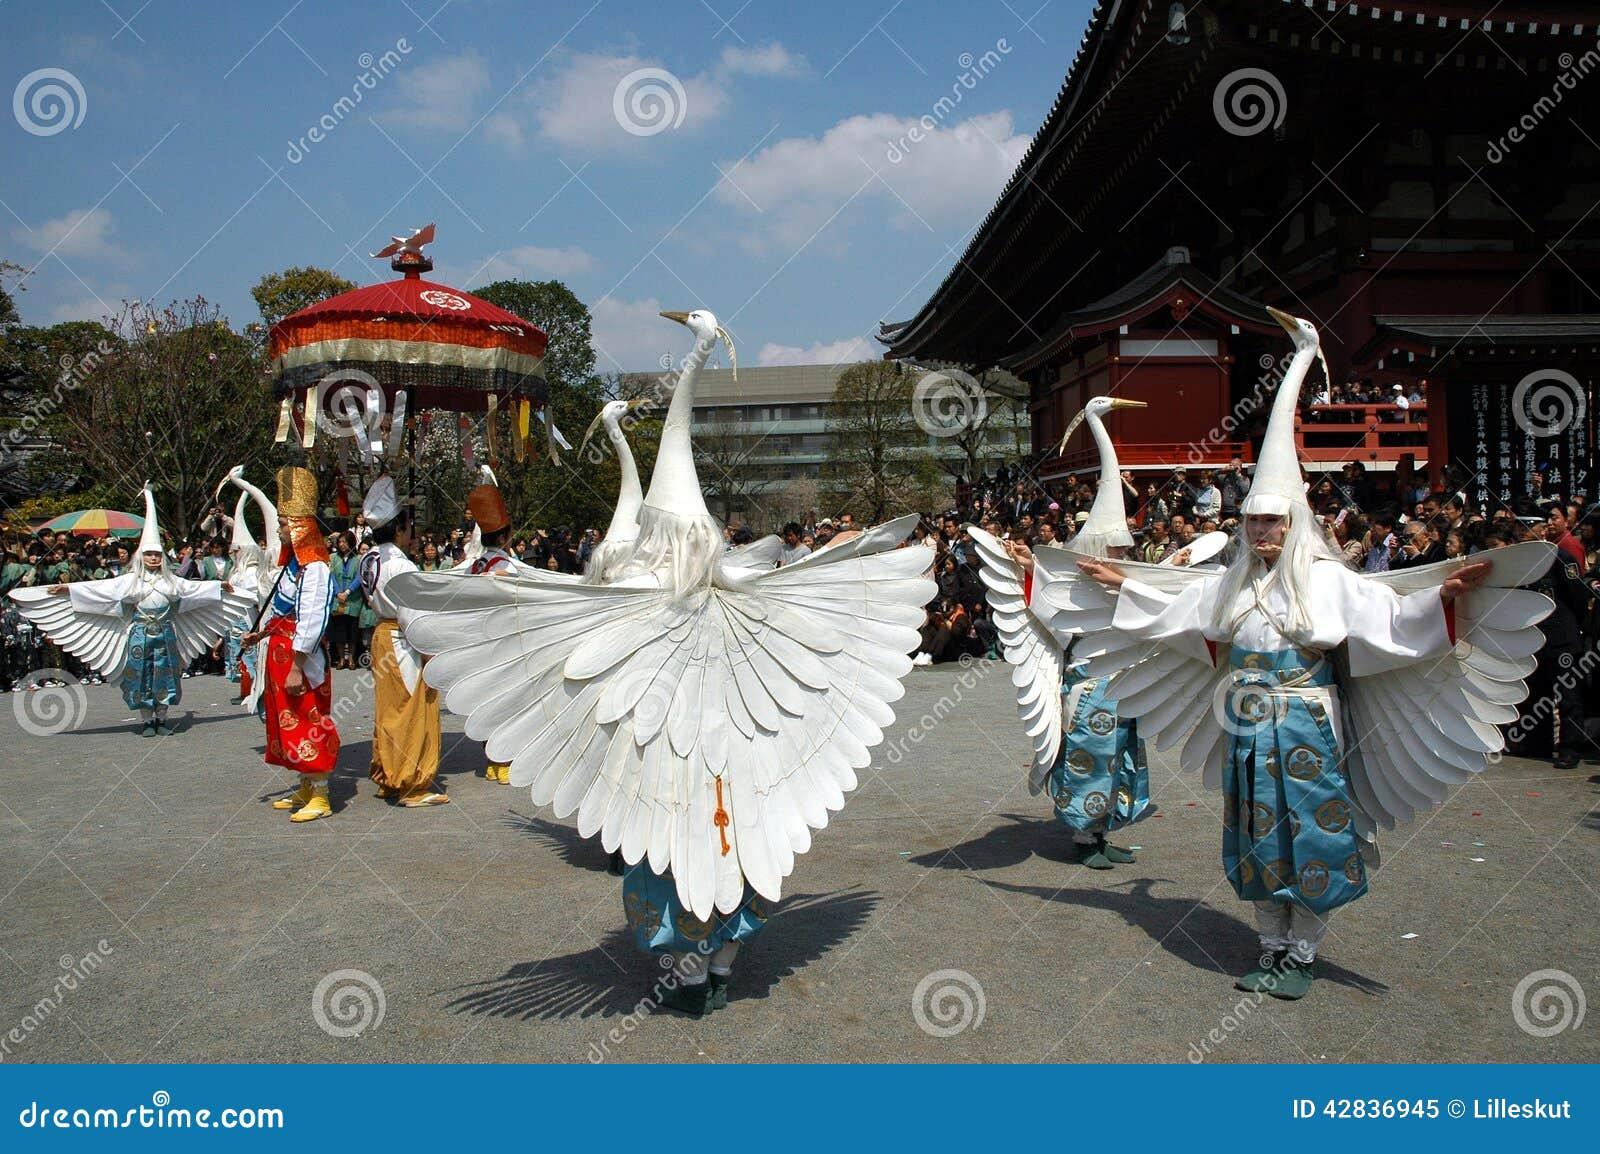 seeley lake buddhist single women Lake bodom  hd brawl in cell block 99  hd seven sisters  hd detroit  hd usurpation  hd aurore  hd tristesse club  hd last call  hd l'étoile de noël  hd .